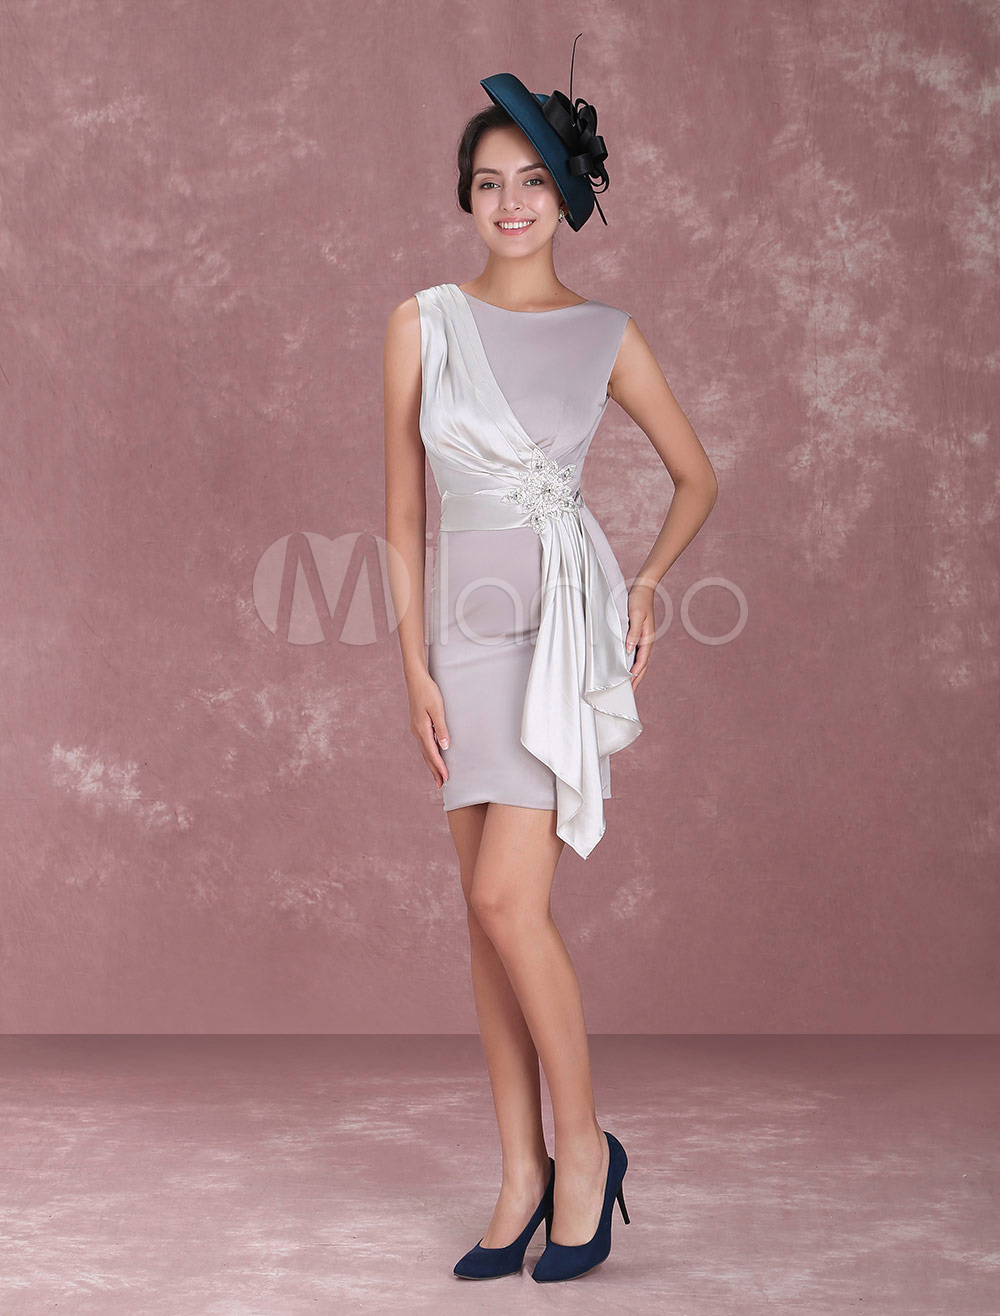 Mother Of The Bride Dresses Short Sheath Light Grey Cocktail Dress Elastic Silk Like Satin Ribbons Mini Wedding Guest Dresses photo